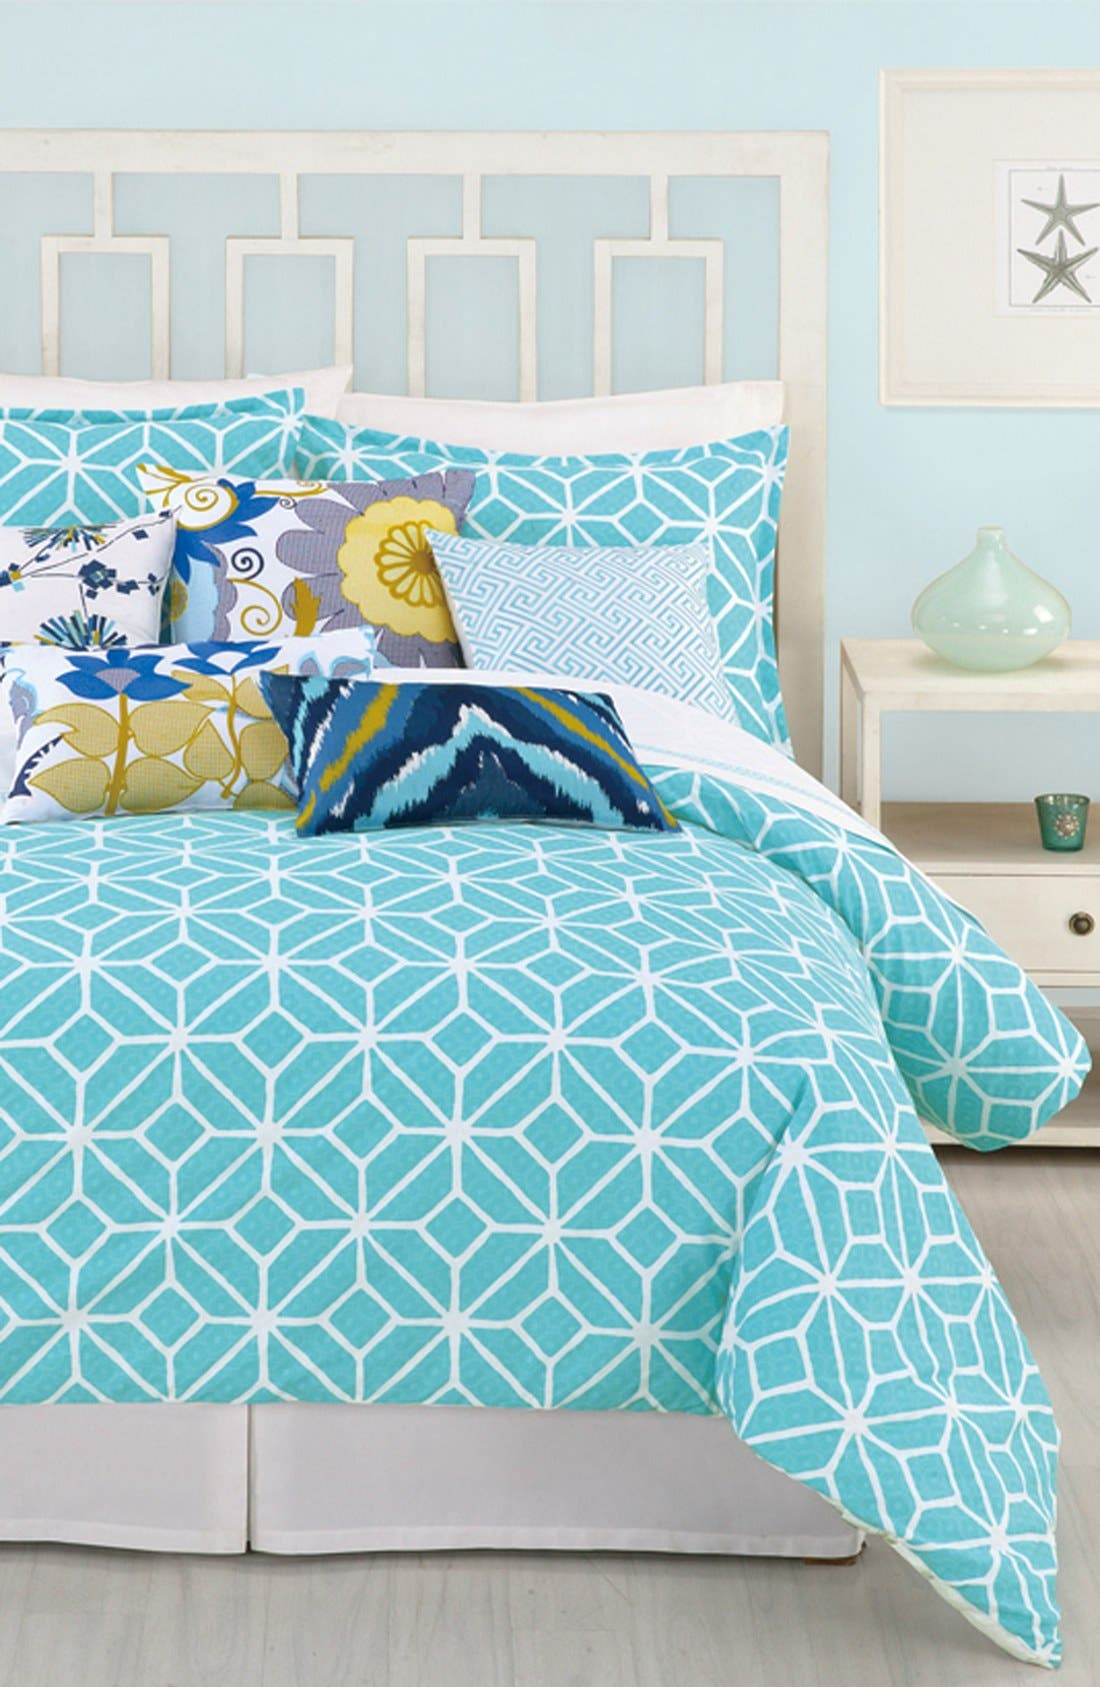 Alternate Image 1 Selected - Trina Turk 'Trellis' Comforter & Shams